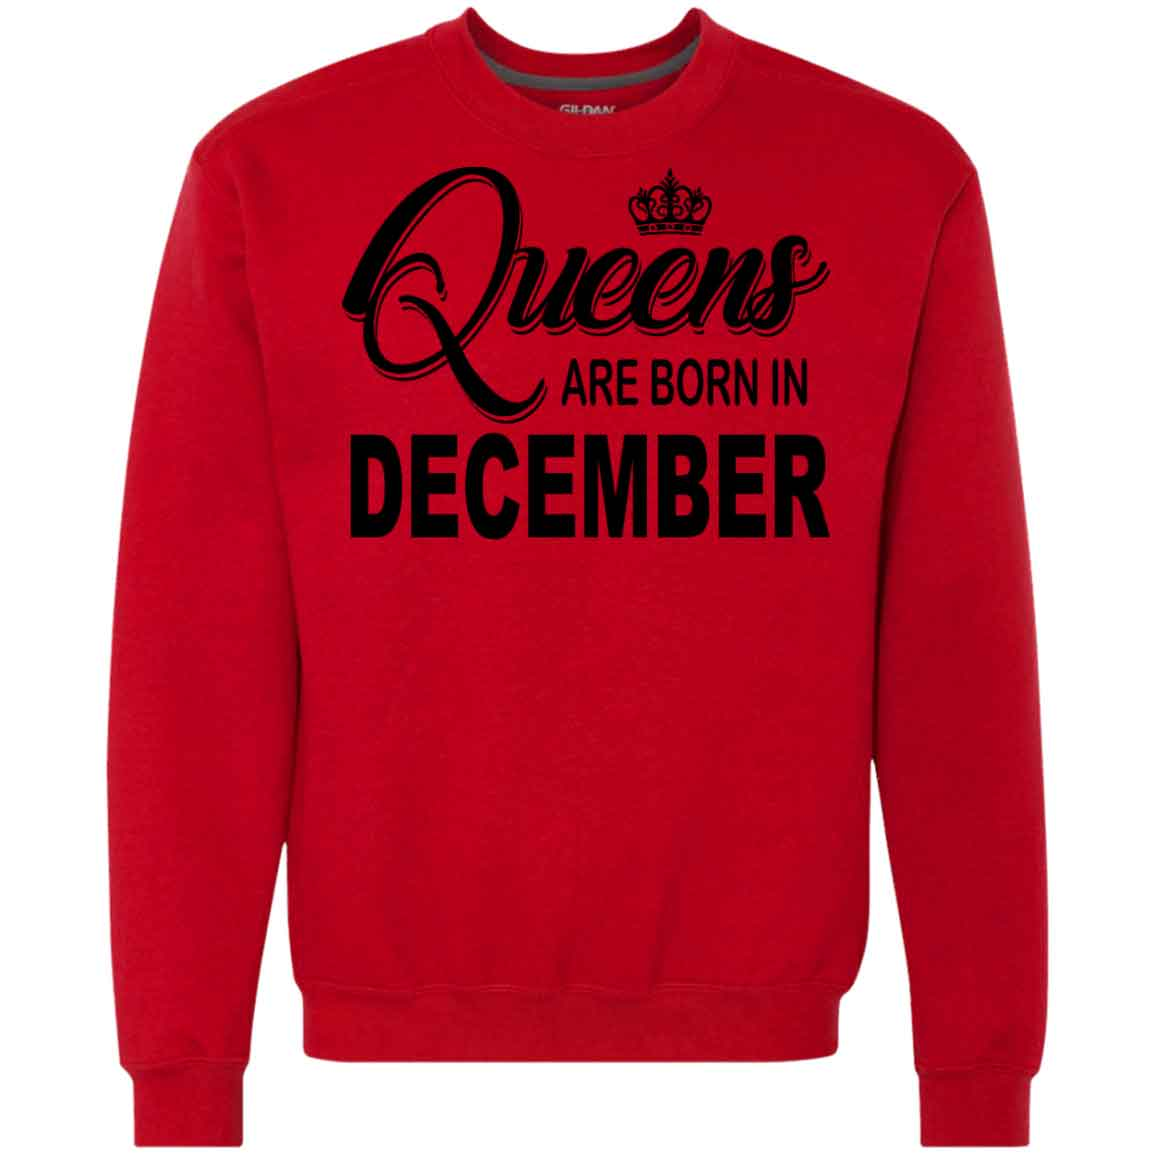 83a7eac3e Birthday Queens Are Born In December Hoodies Sweatshirts – TeeTrio